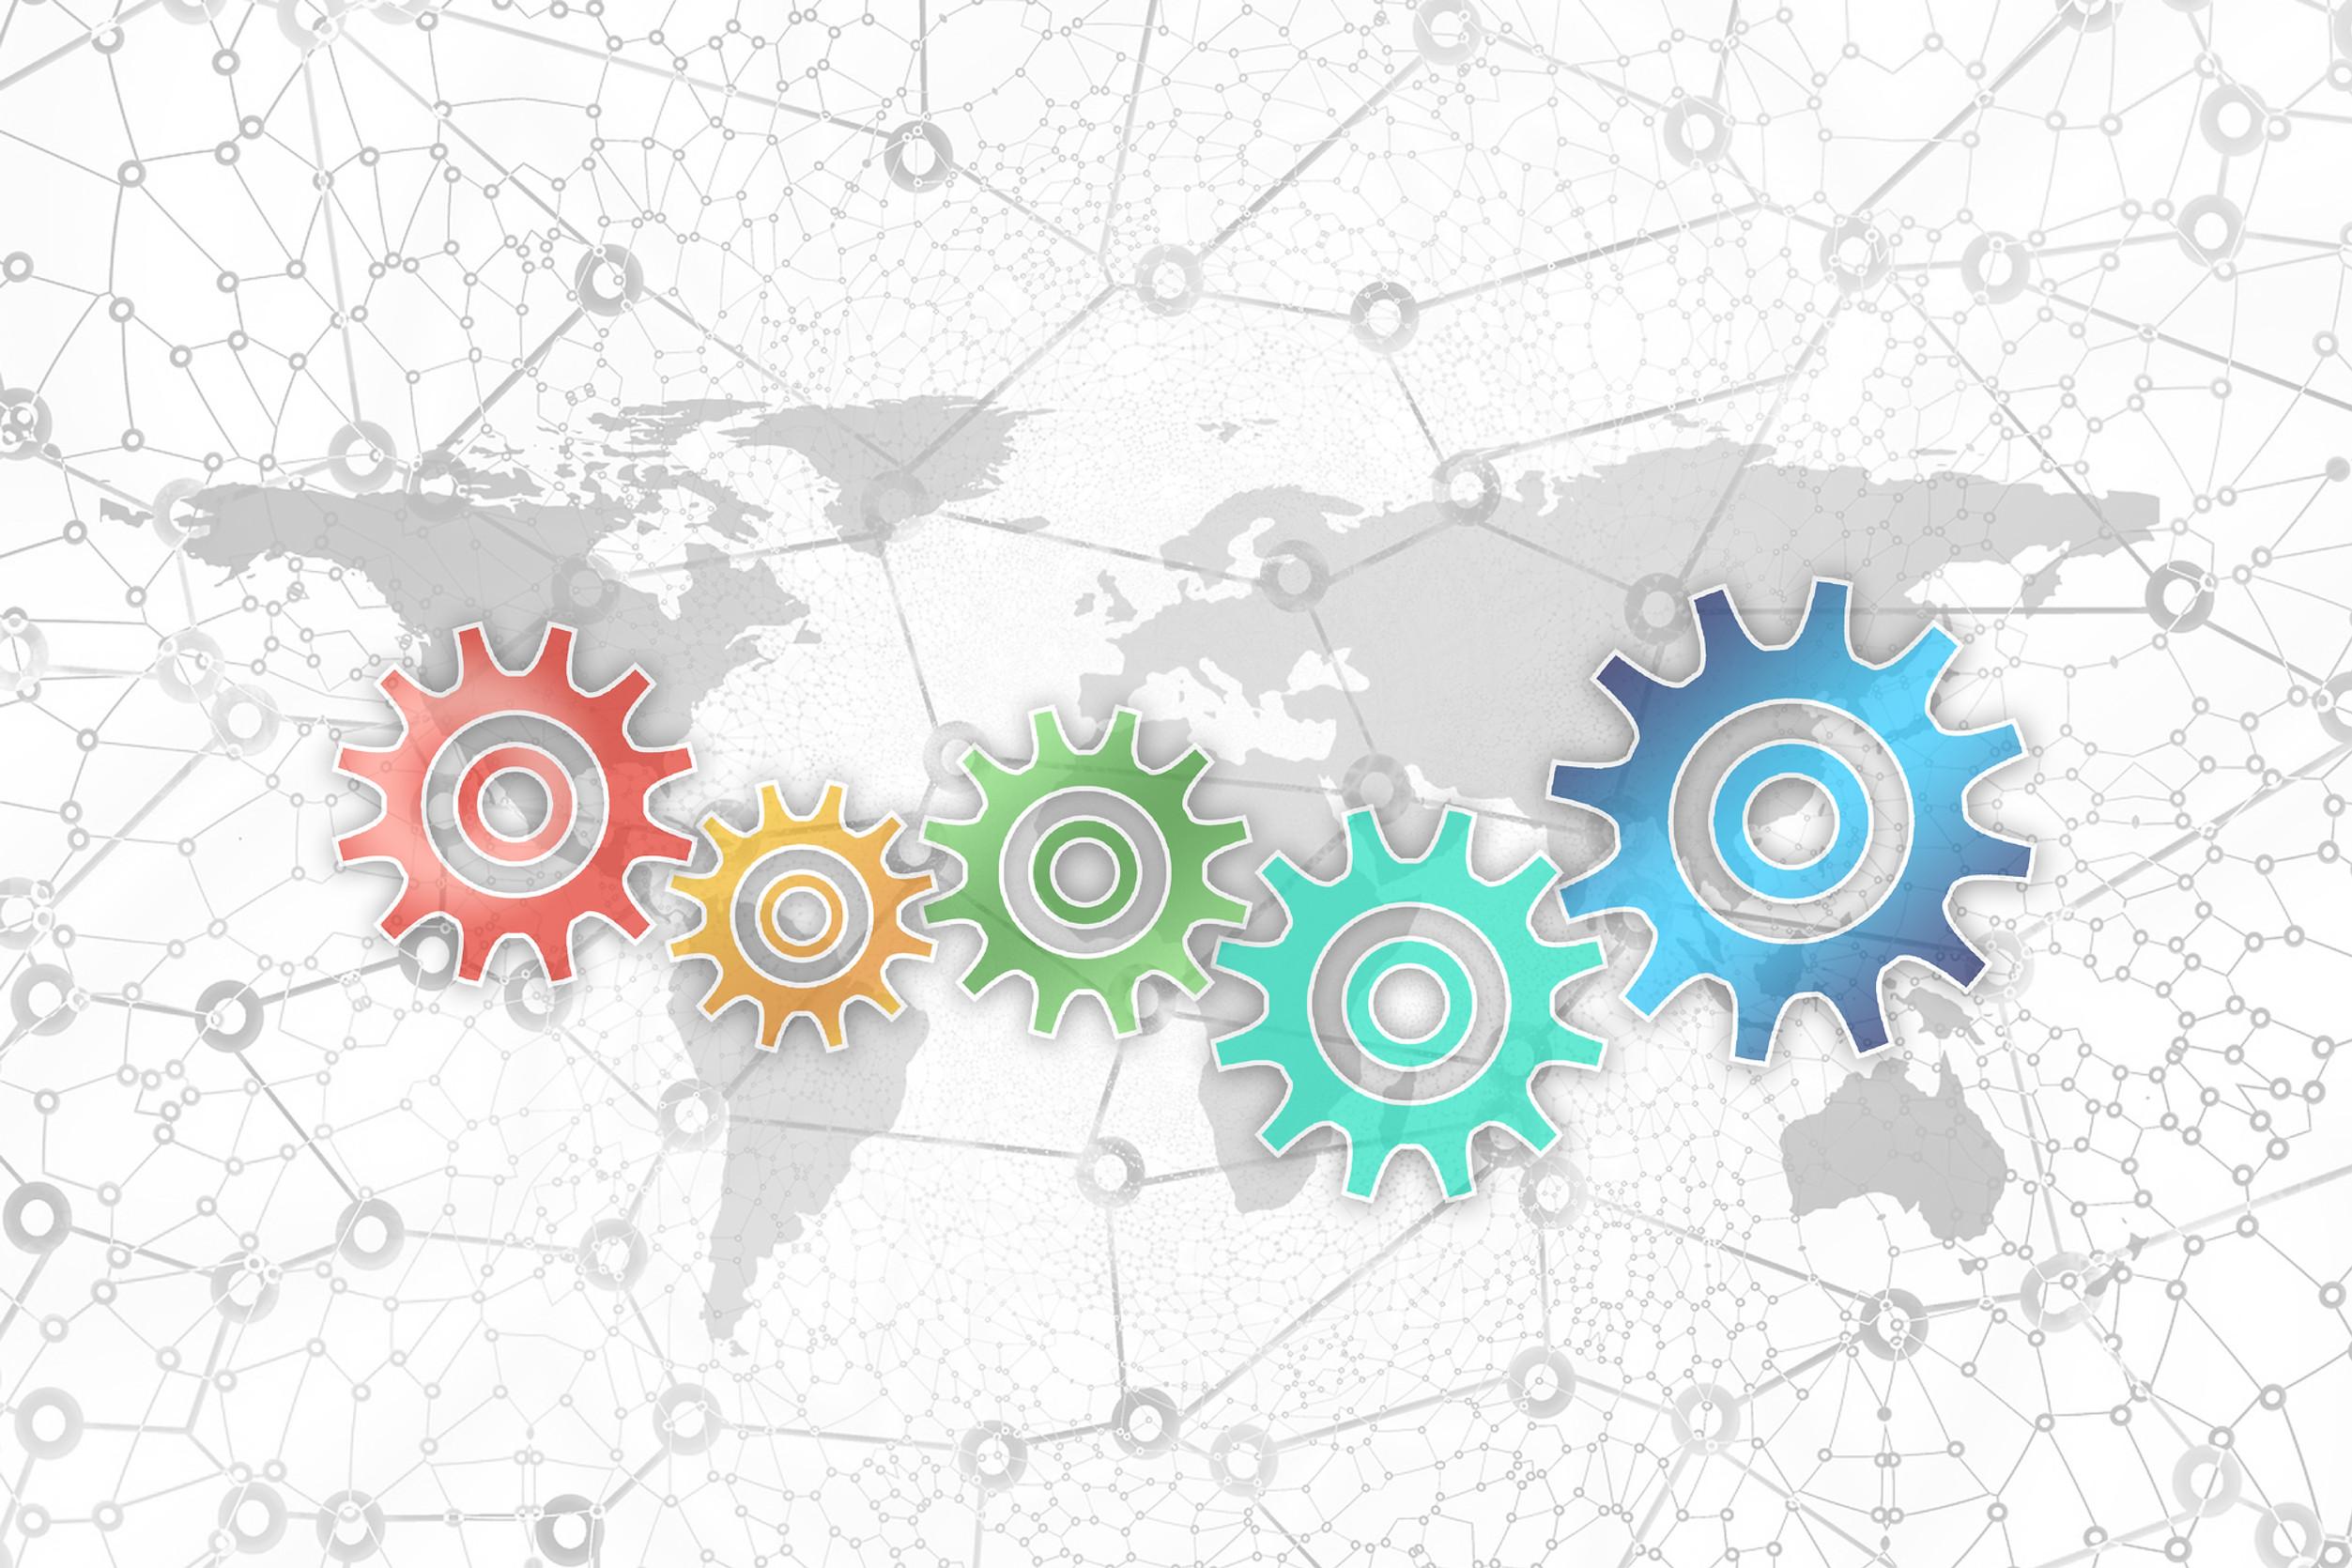 Netzwerk komplettneuohneText.jpg